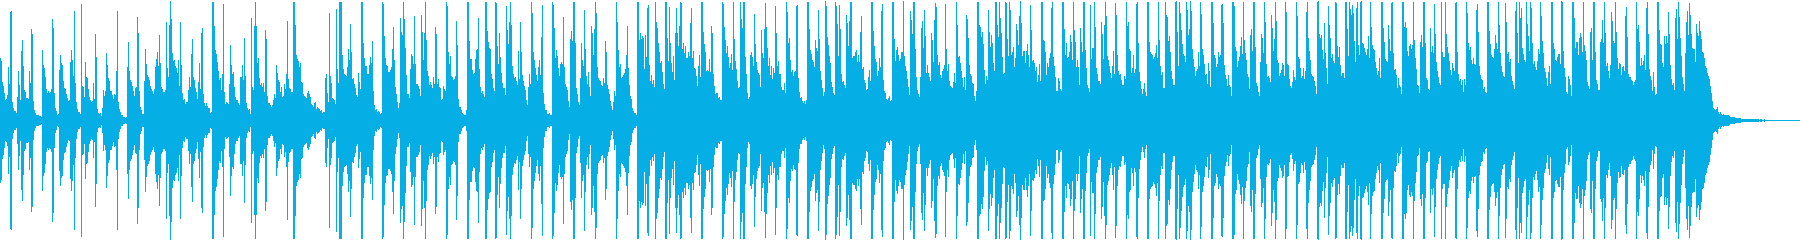 Happy Funny Joyful Fork's reproduced waveform